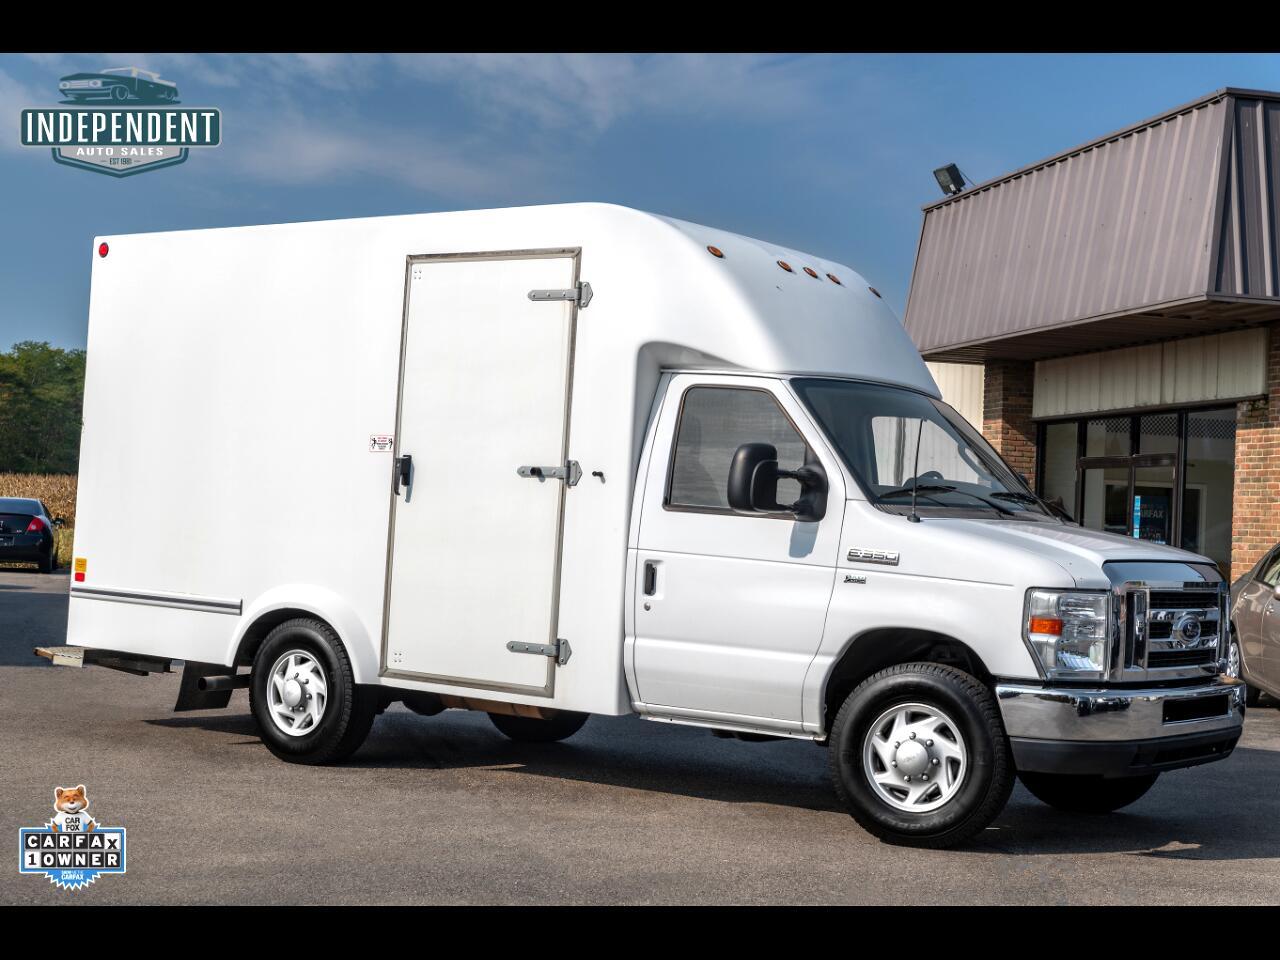 2012 Ford Econoline Commercial Cutaway E-350 Super Duty Box Truck